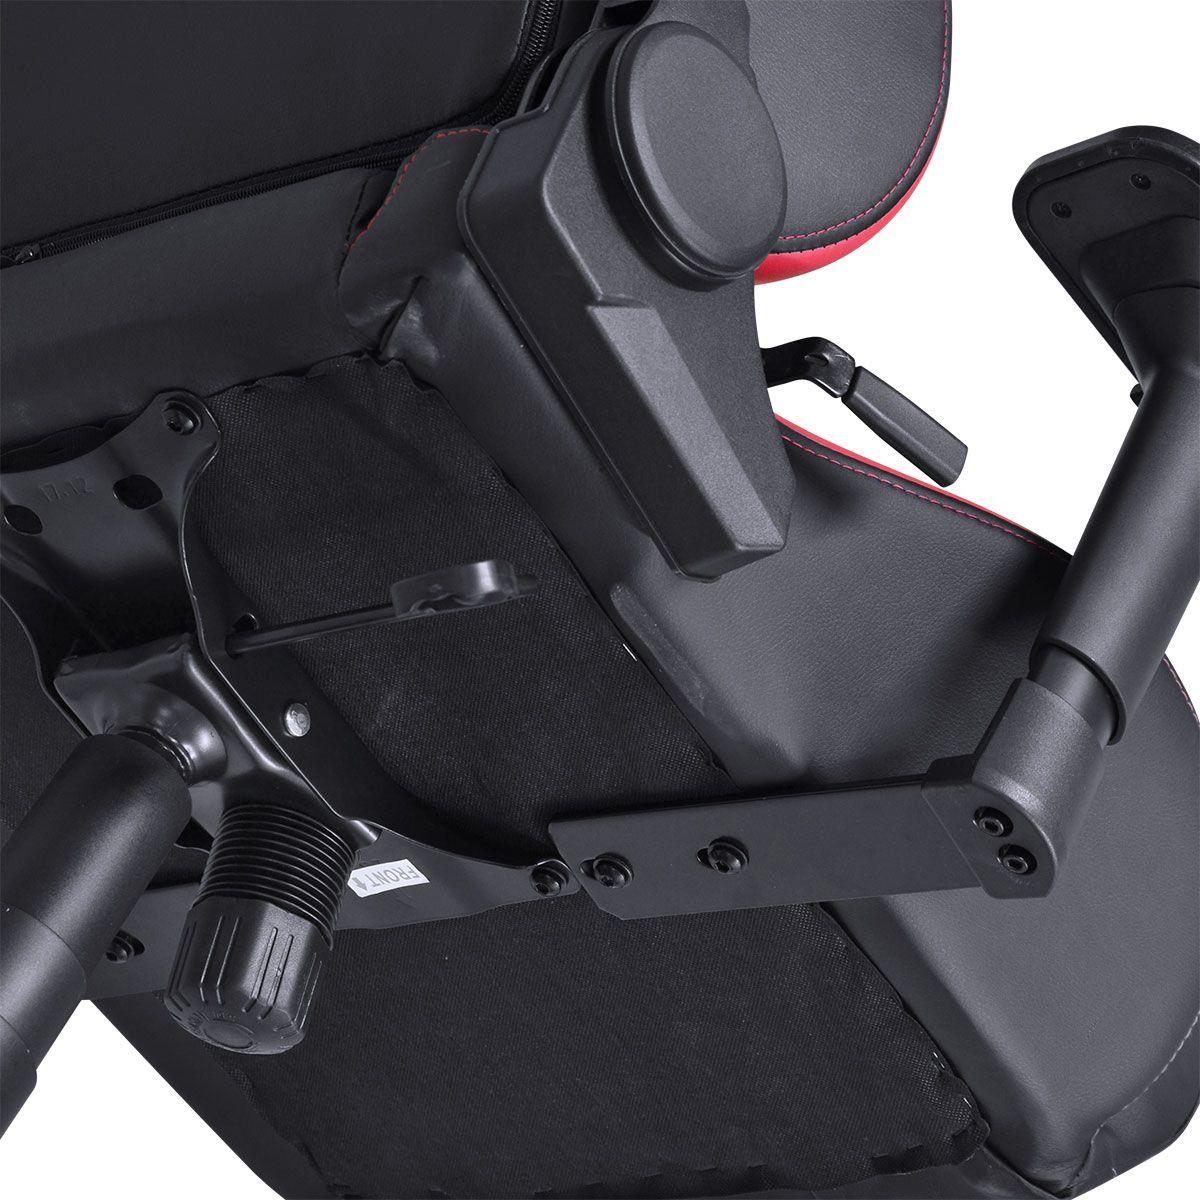 Cadeira Gamer Mad Racer V10 Preto/Vermelho MADV10VMGL - Pcyes